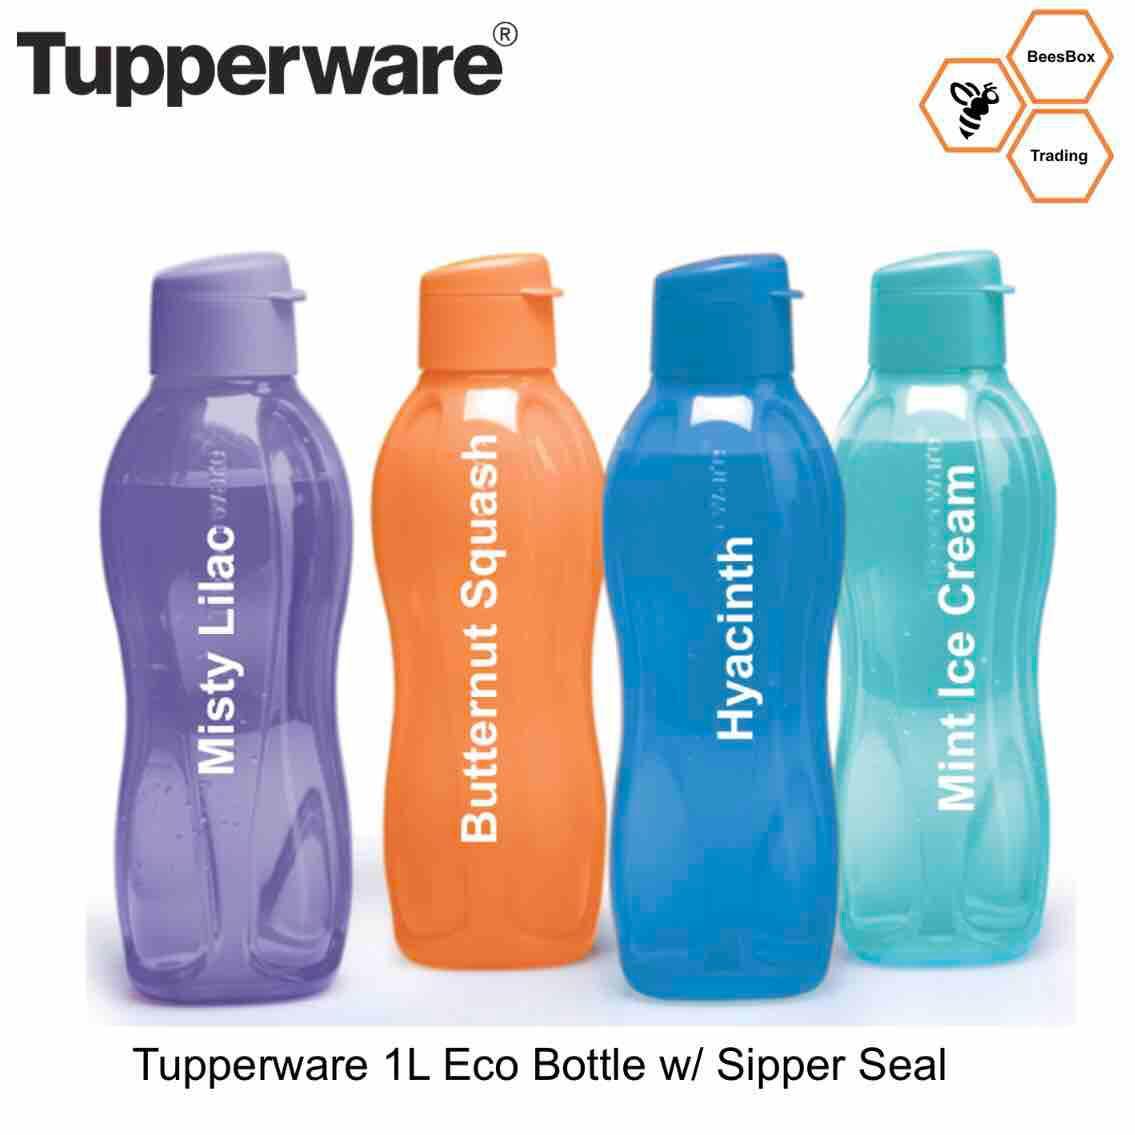 Tupperware Brands Philippines Price List Water Eleganzia Bowl 600ml 4 Set Eco Bottle 1l W Sipper Seal